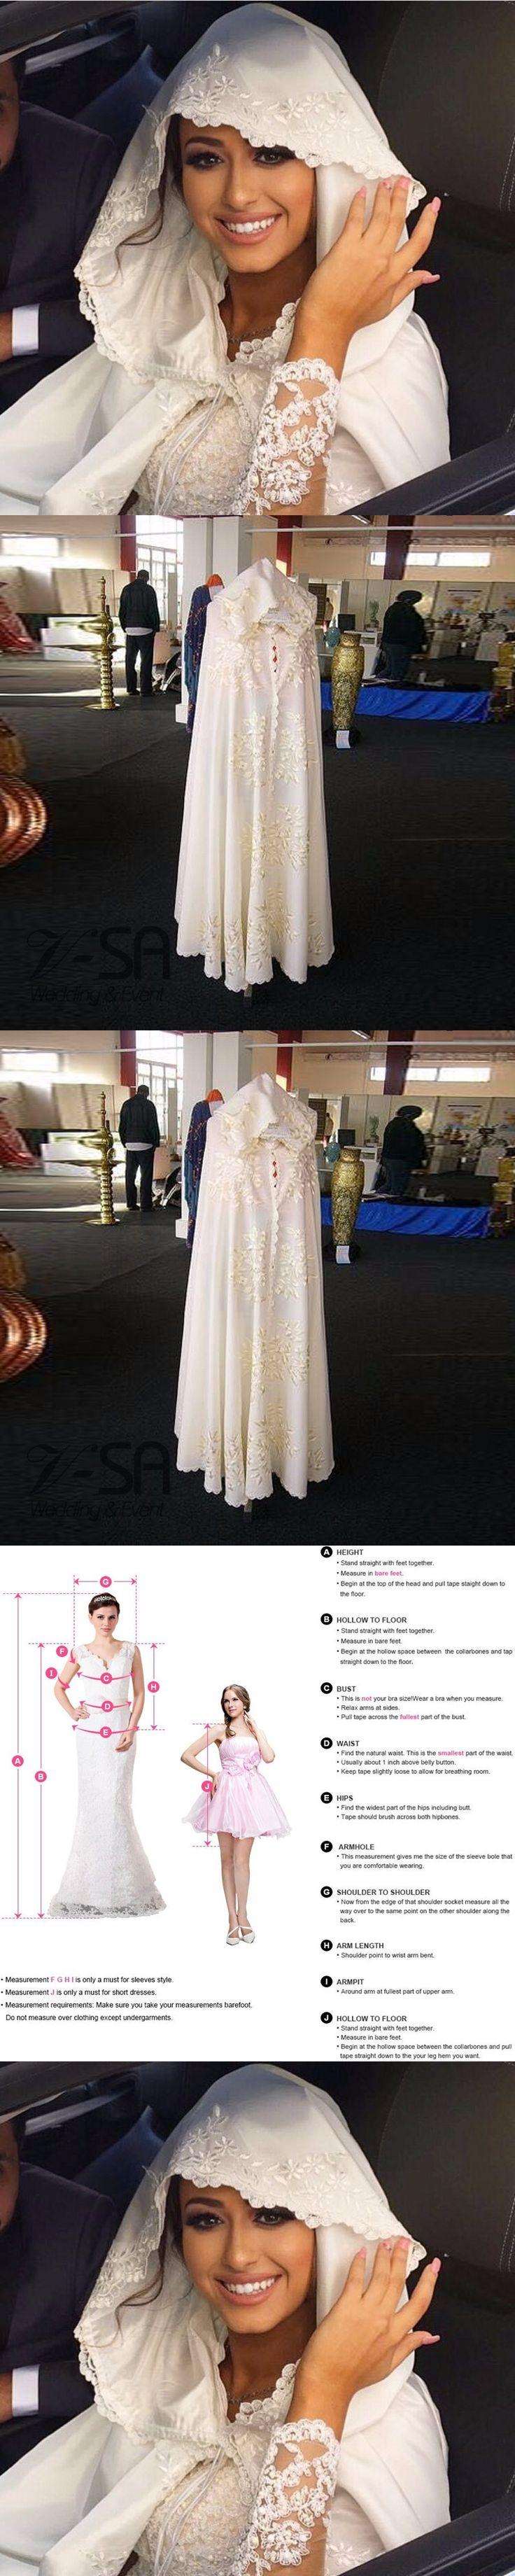 Princess Muslim Women Bridal Cap Embroidery Wedding Jacket Islamic Hijab Custom Made Luxury Shawl For Wedding 2017